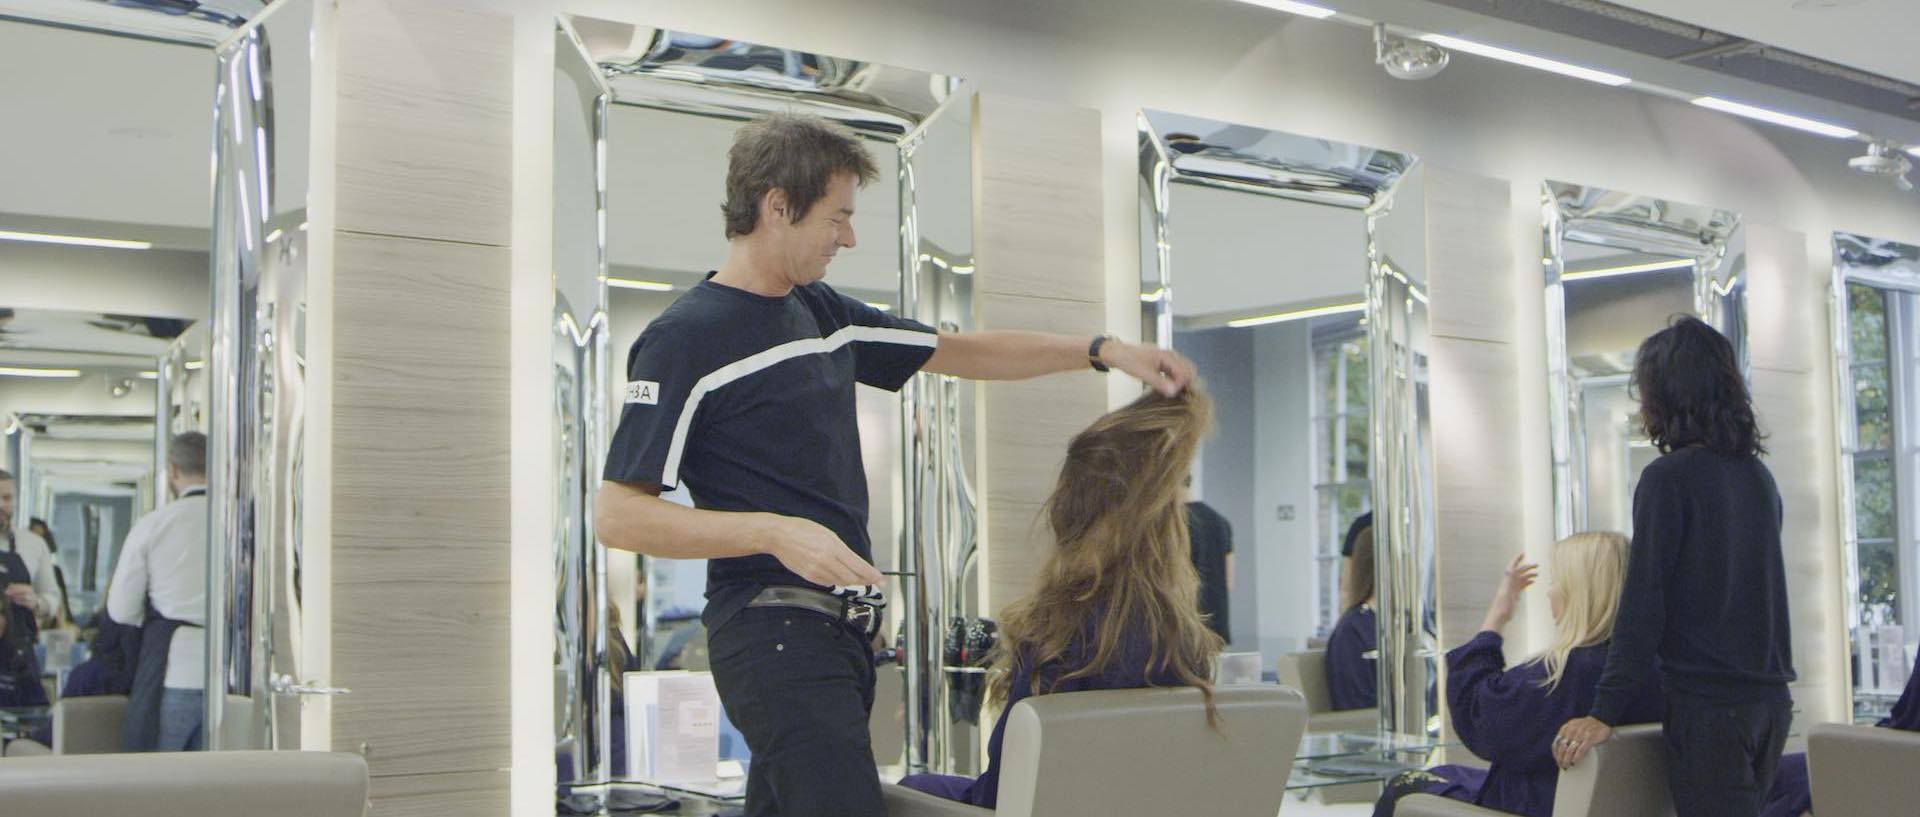 Anattic-Shortcuts-Richard-Ward-Hair-&-Metrospa2.jpeg